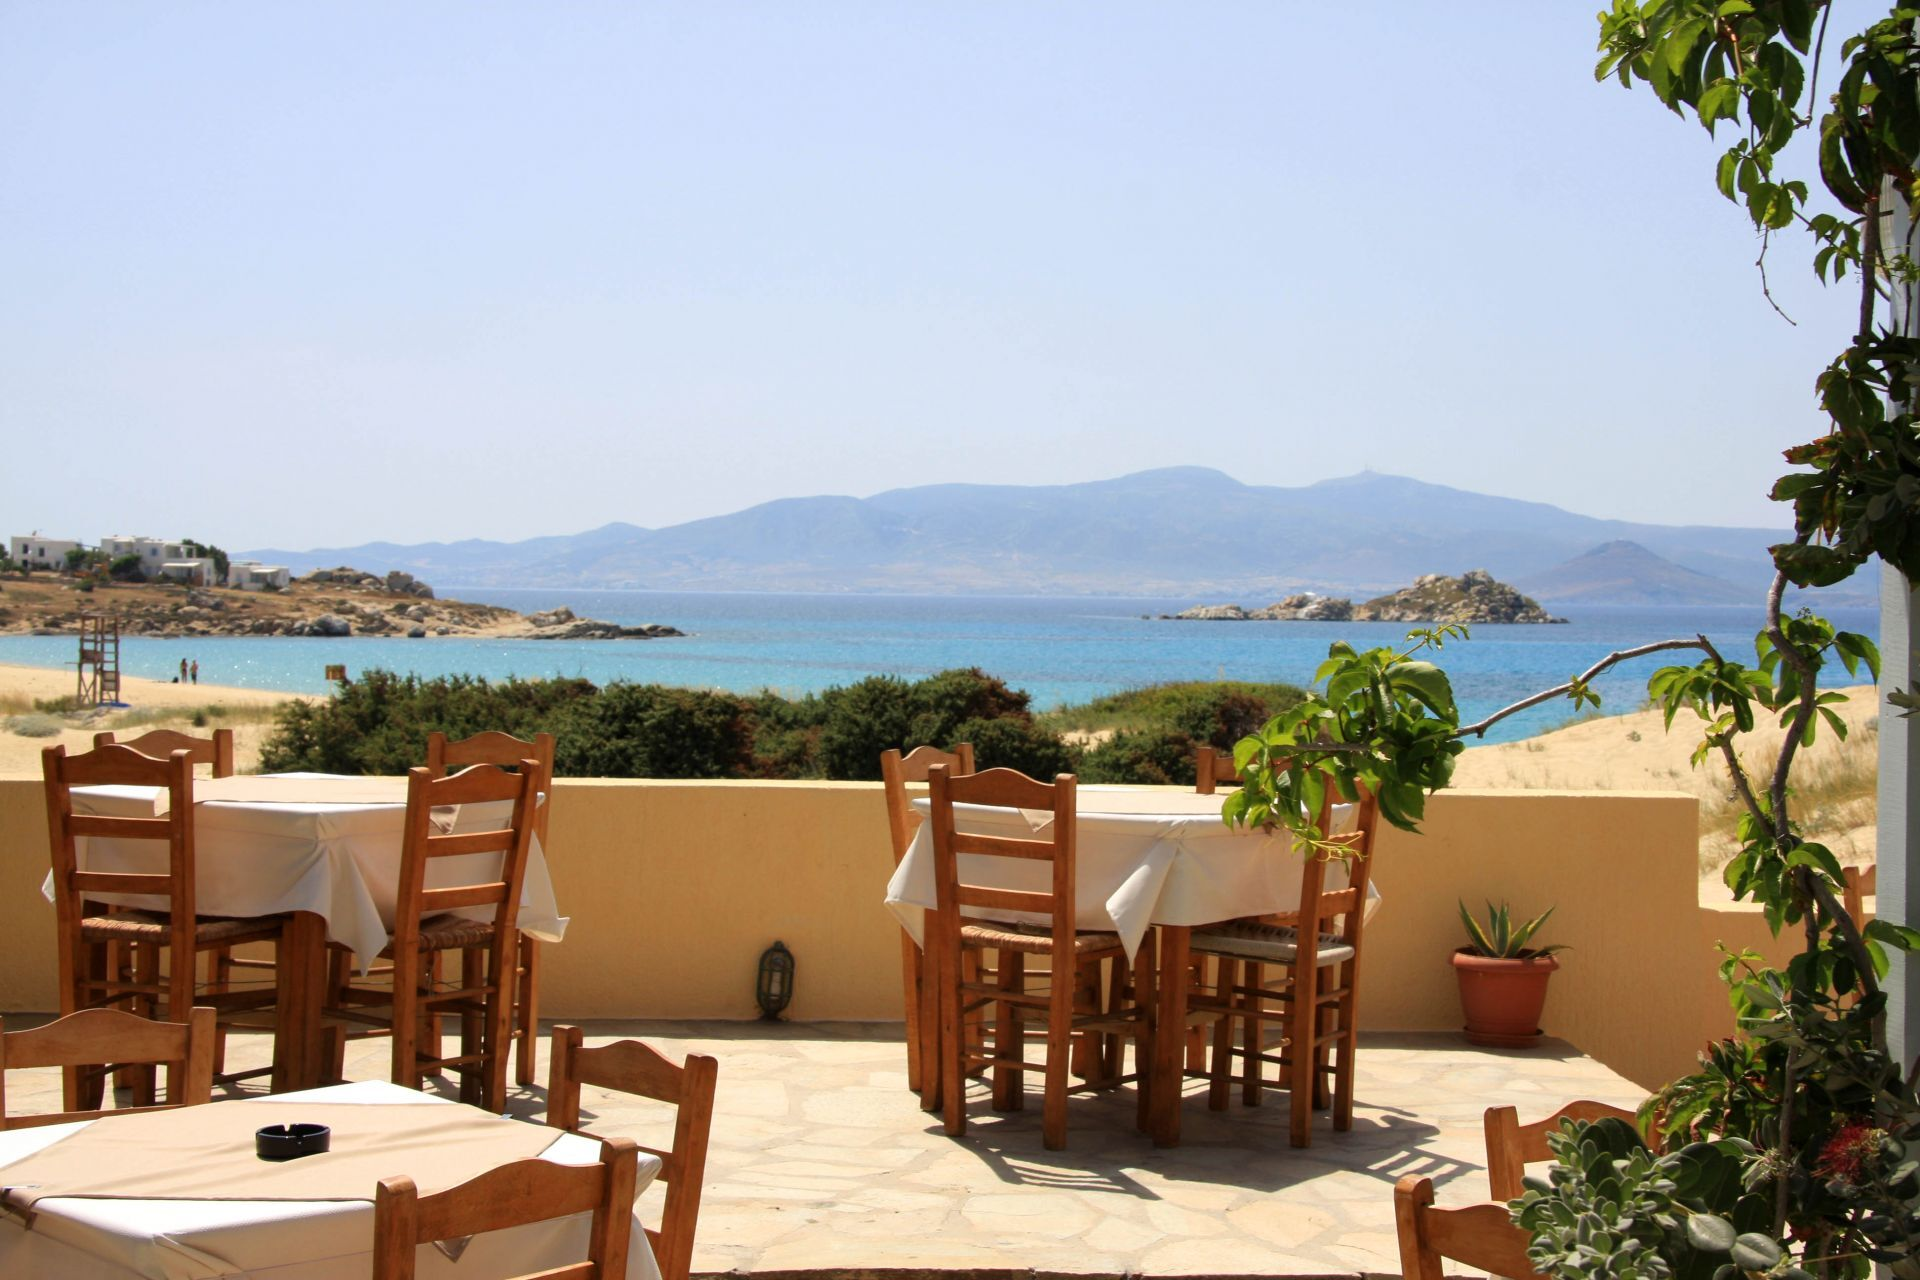 Restaurants in Naxos